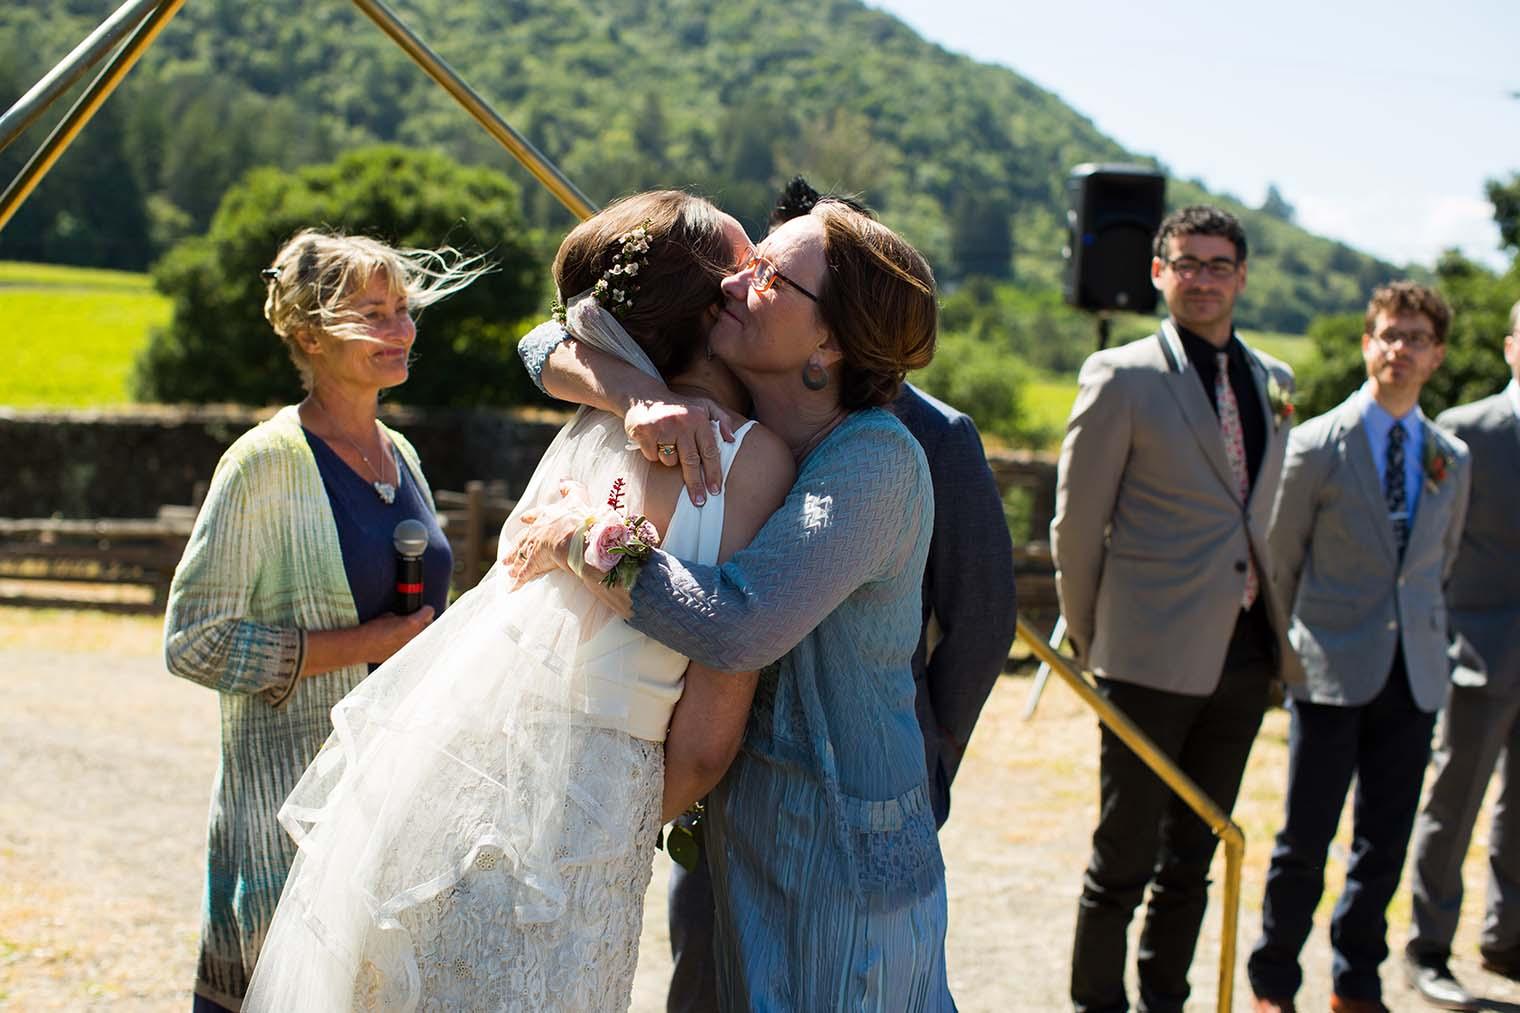 jack london state historic park wedding ceremony